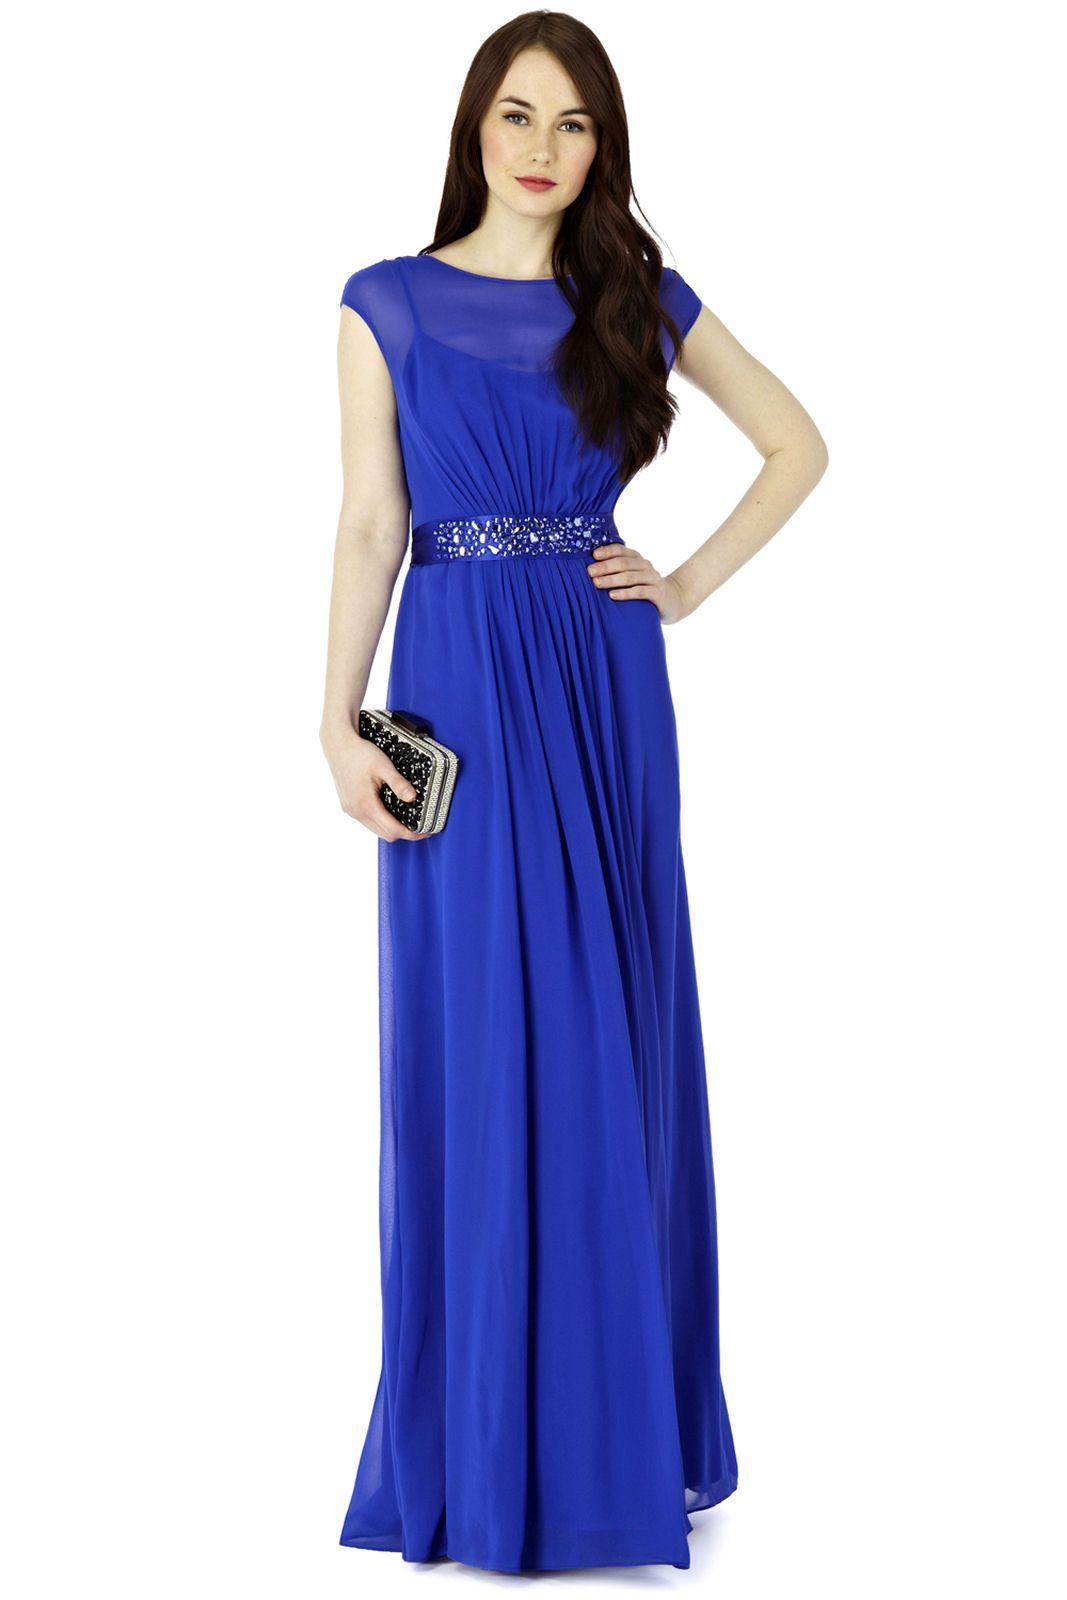 cobalt blue bridesmaid dresses | Lori Lee Maxi Dress Cobalt Blue ...